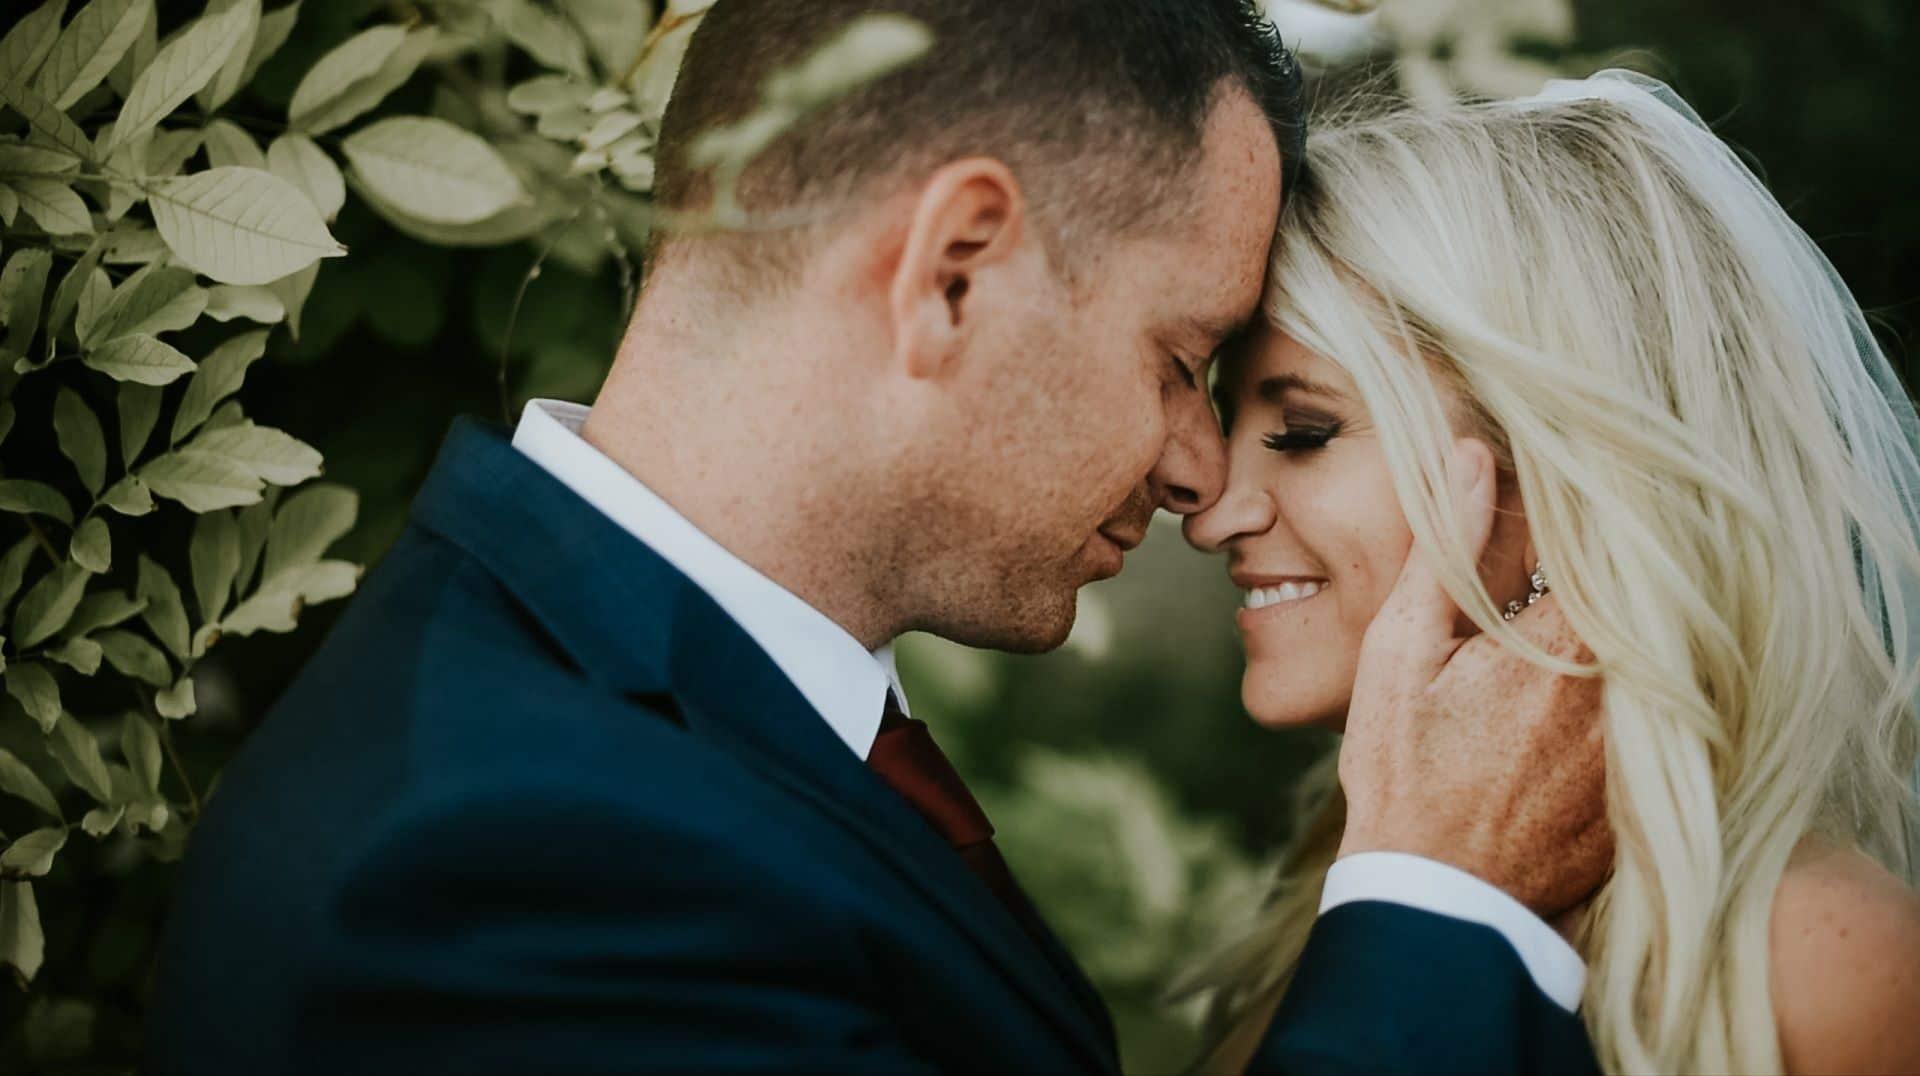 mariage wedding limoges photographe videaste limousin chateau